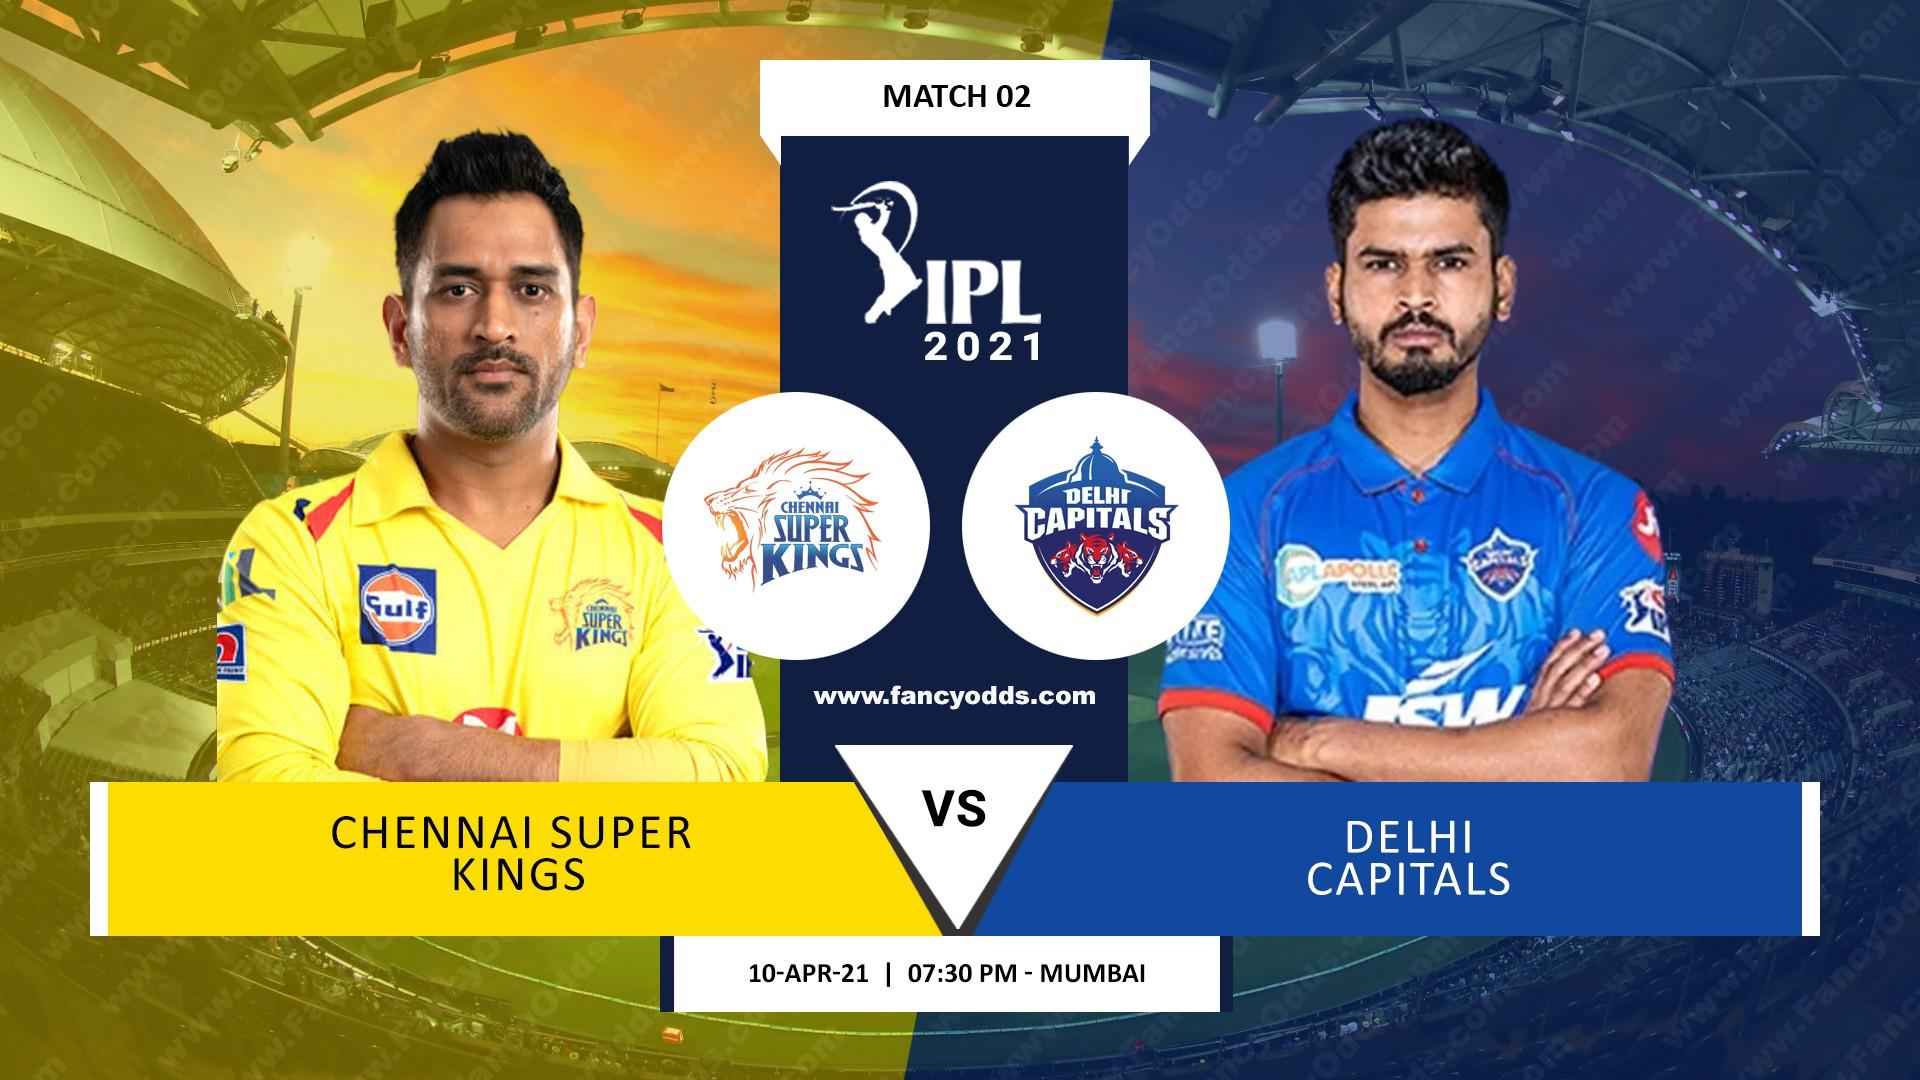 IPL 2021 M02: CSK Vs DC Match Timings Date Live Score Updates | Vivo IPL 2021 Chennai Super Kings Vs Delhi Capitals 2nd Match Venue Location Fixture Squad